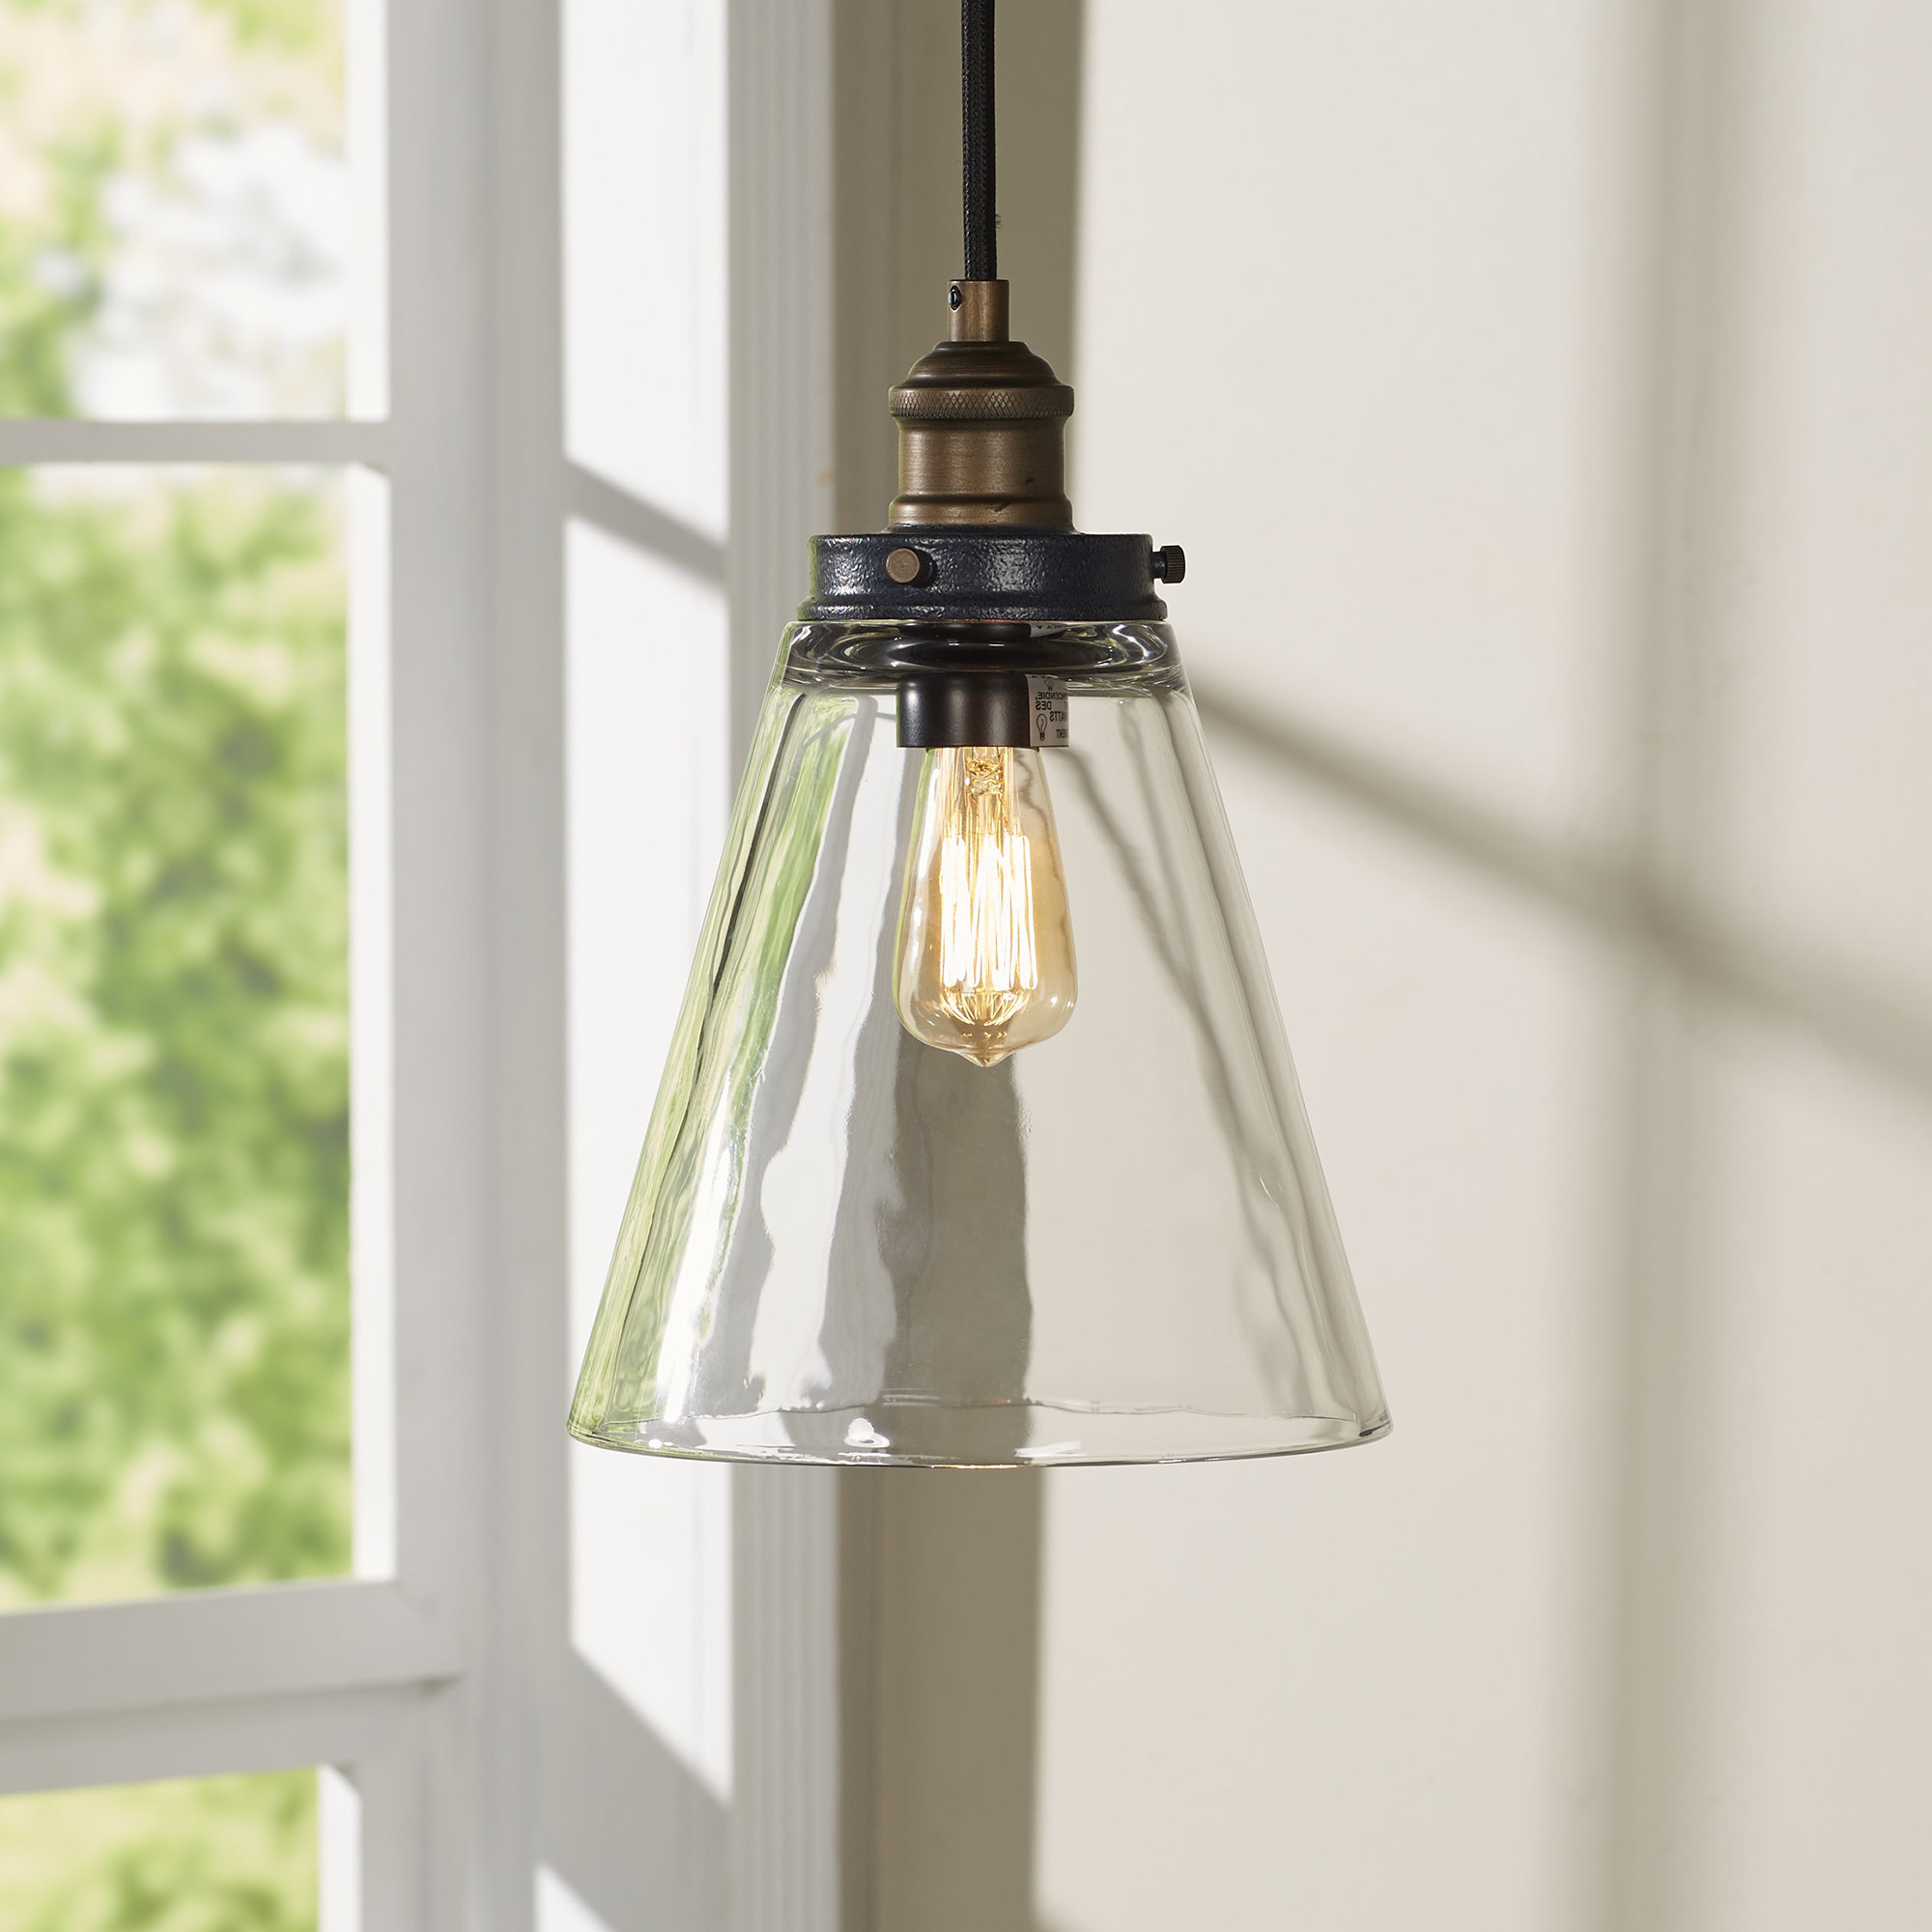 2019 Akakios 1 Light Single Bell Pendants Pertaining To Bedford 1 Light Bell Pendant (View 2 of 25)